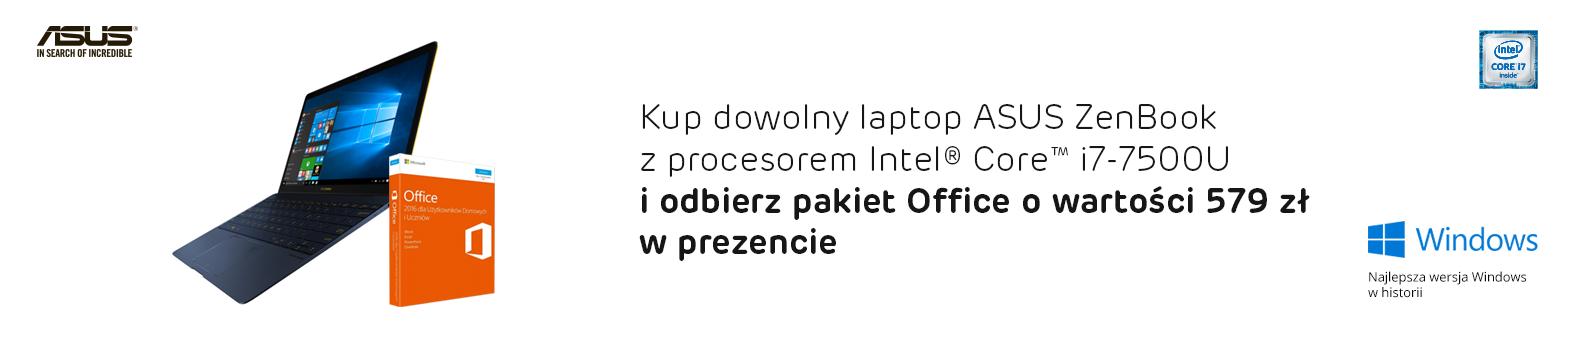 pakiet Office gratis